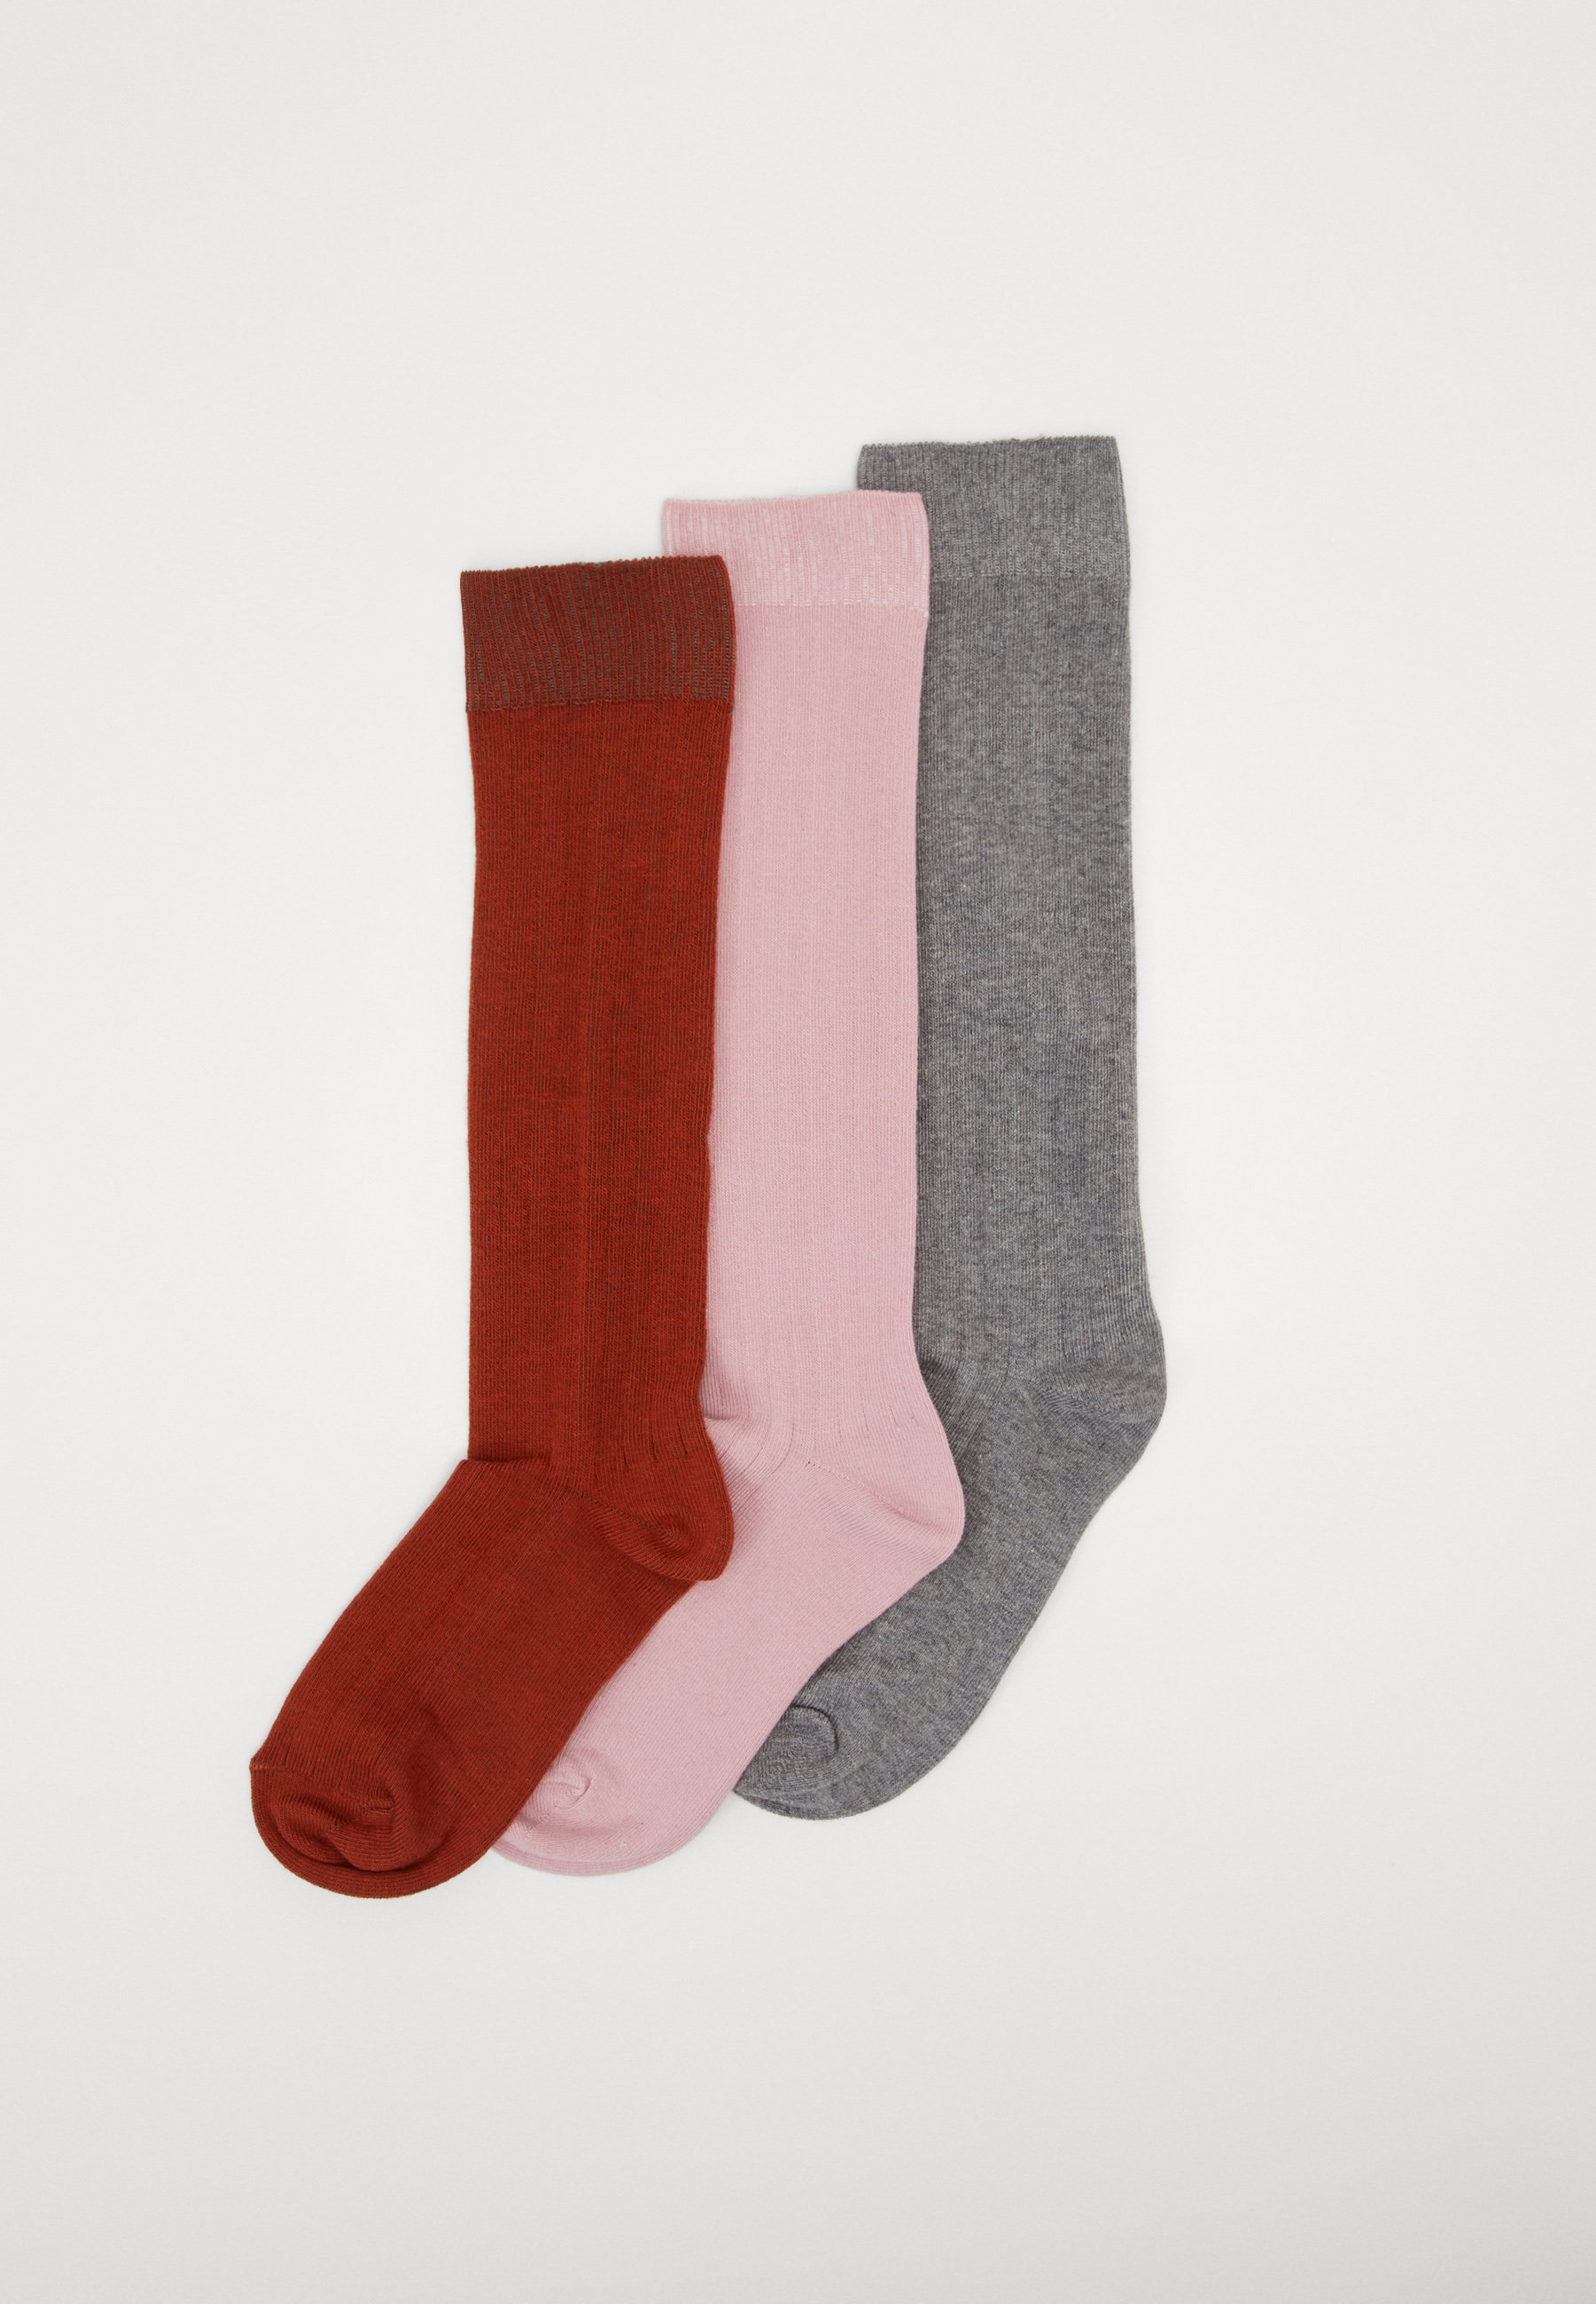 Kids KIDS KNEESOCKS 3 PACK - Knee high socks